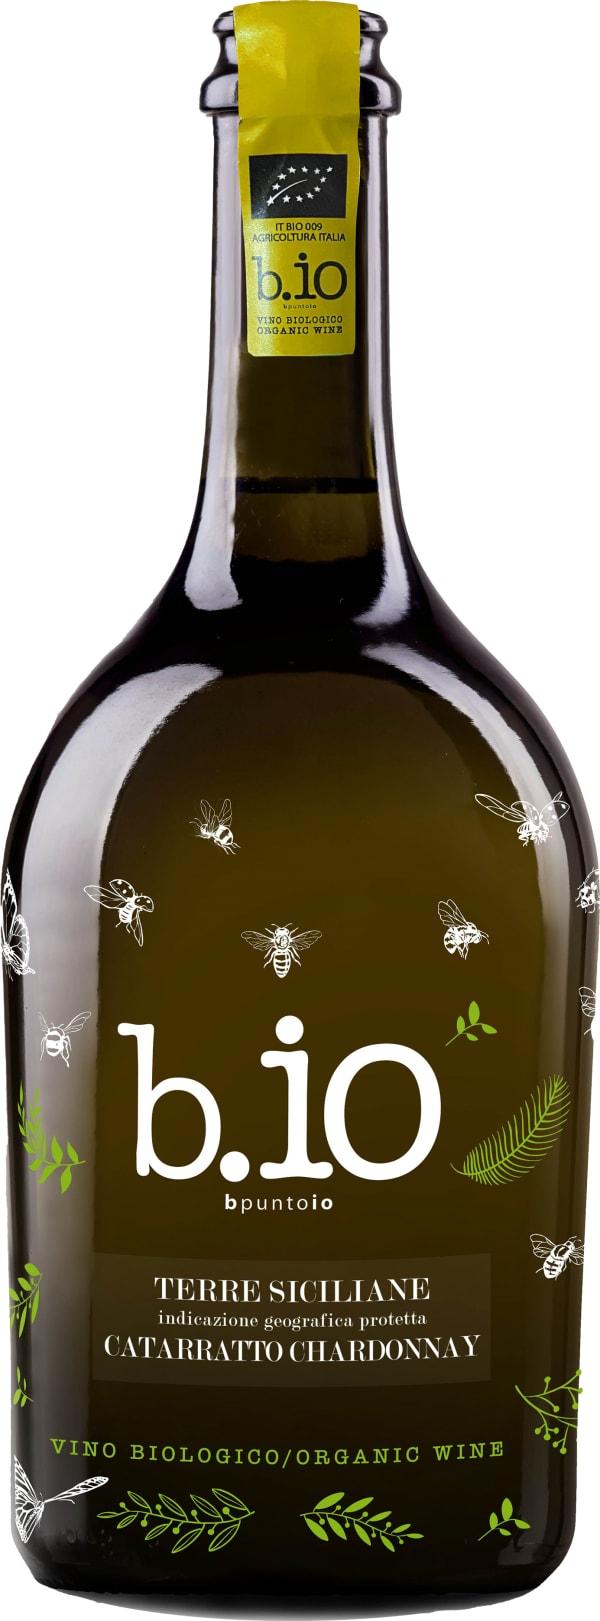 B.io Catarratto Chardonnay Vino Biologico 2017